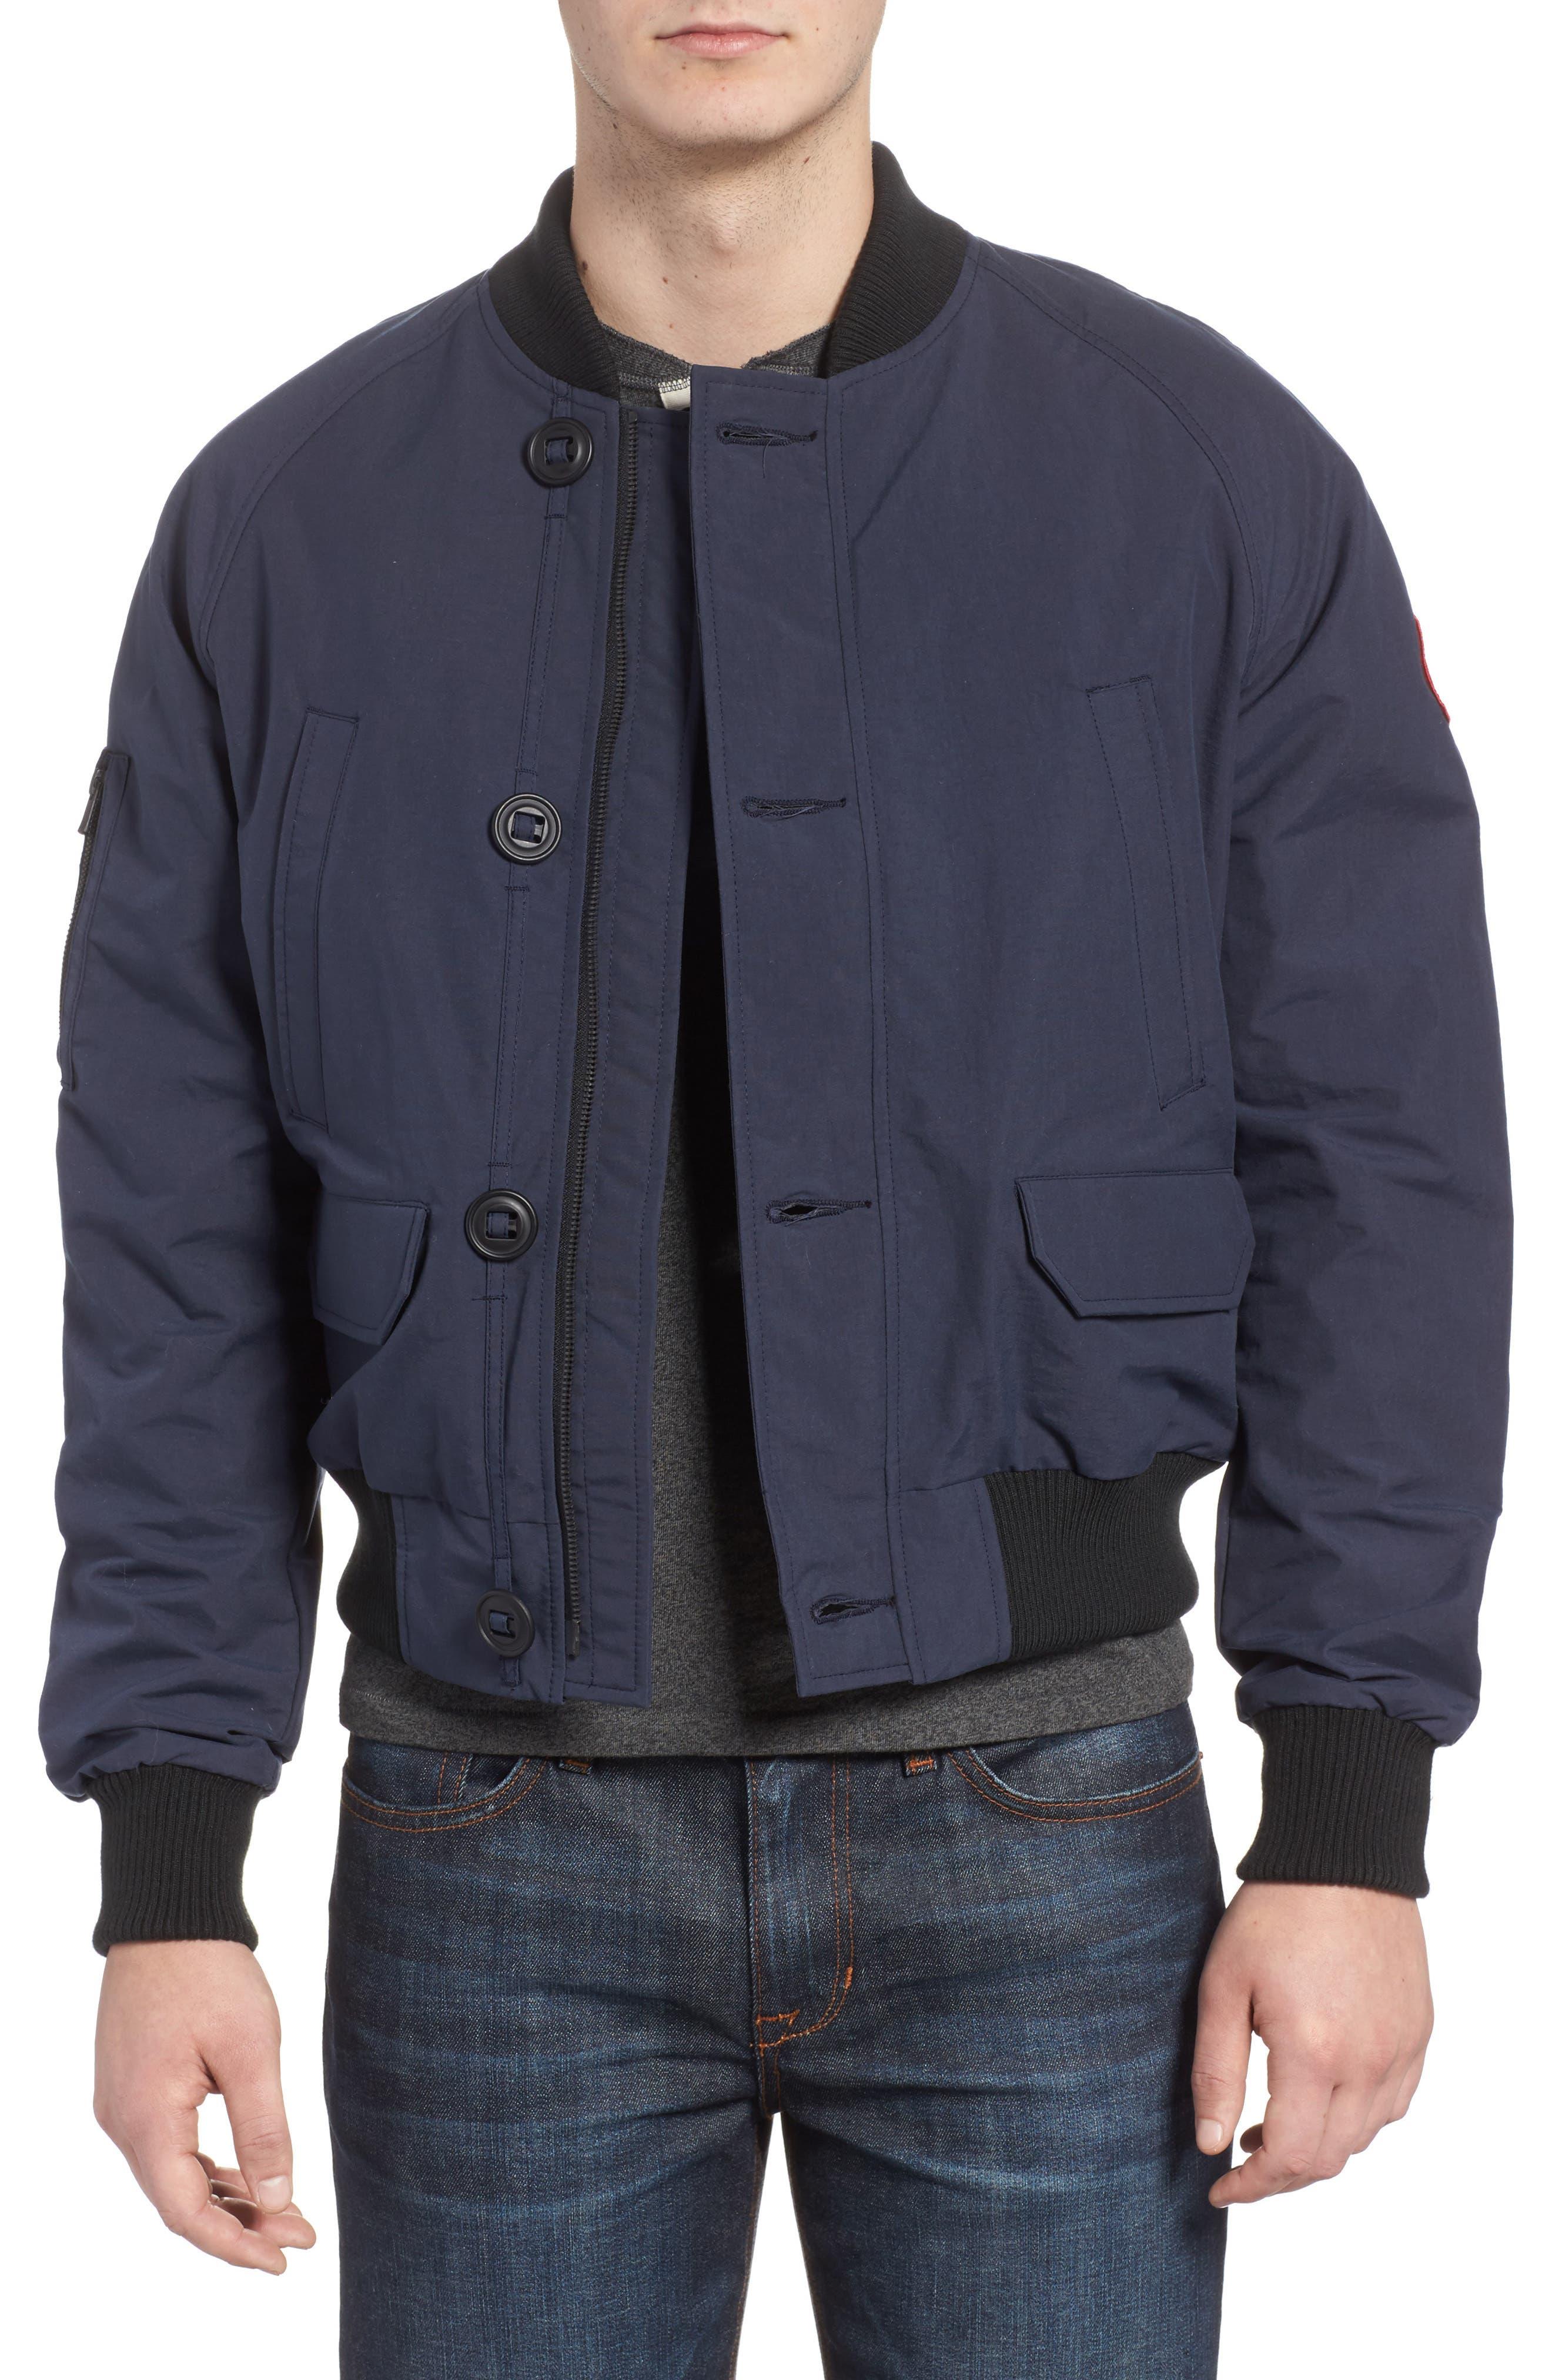 CANADA GOOSE Faber Slim Fit Bomber Jacket, Main, color, 400